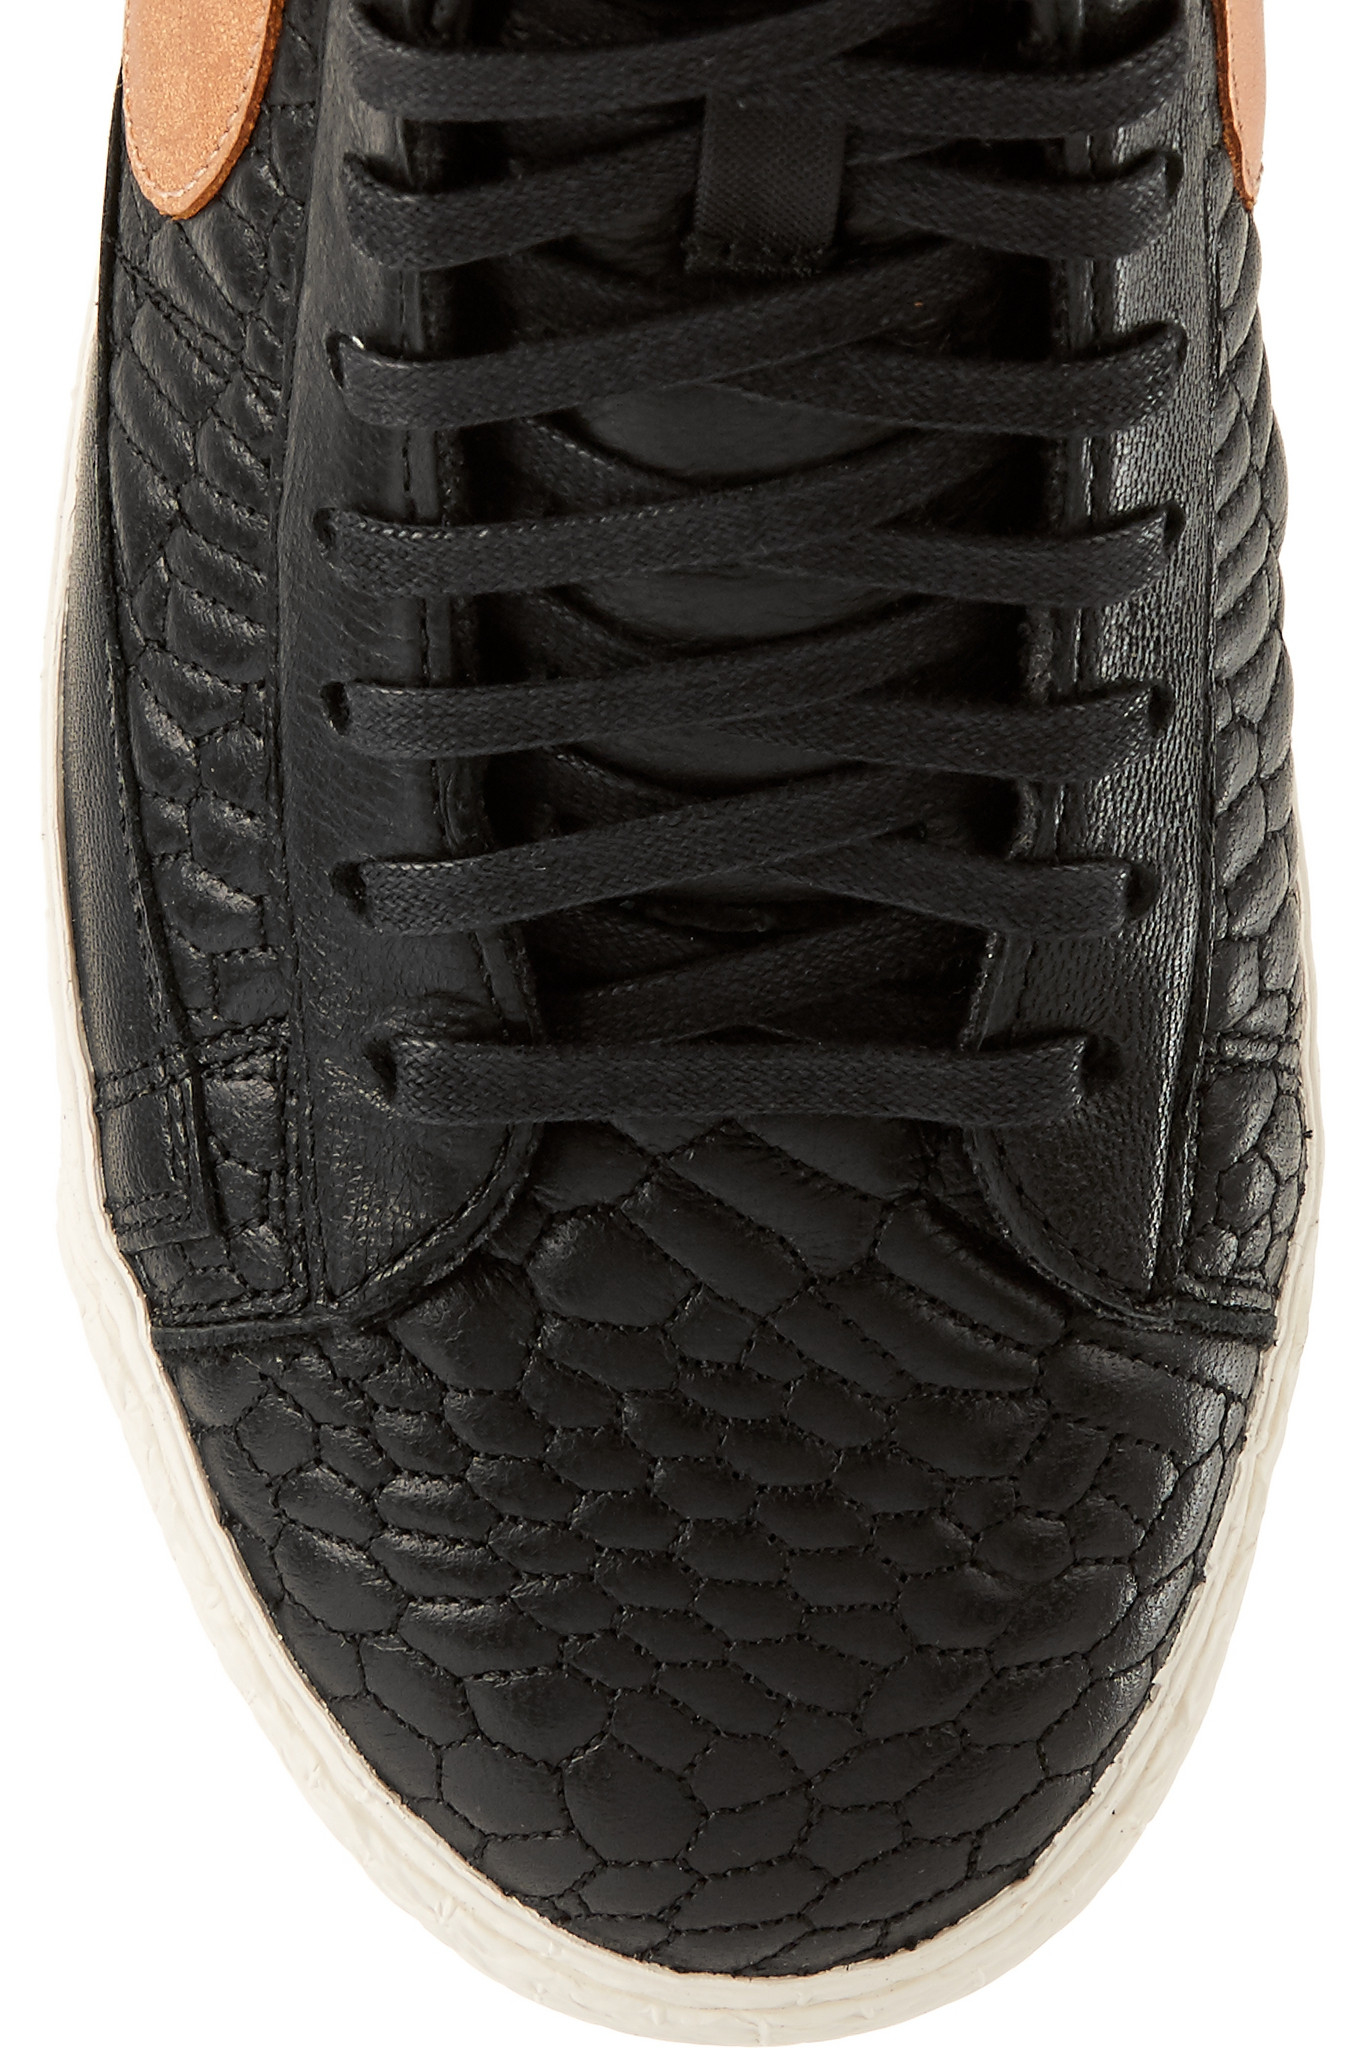 Nike - Blazer Croc-effect Leather High-top Sneakers - Black